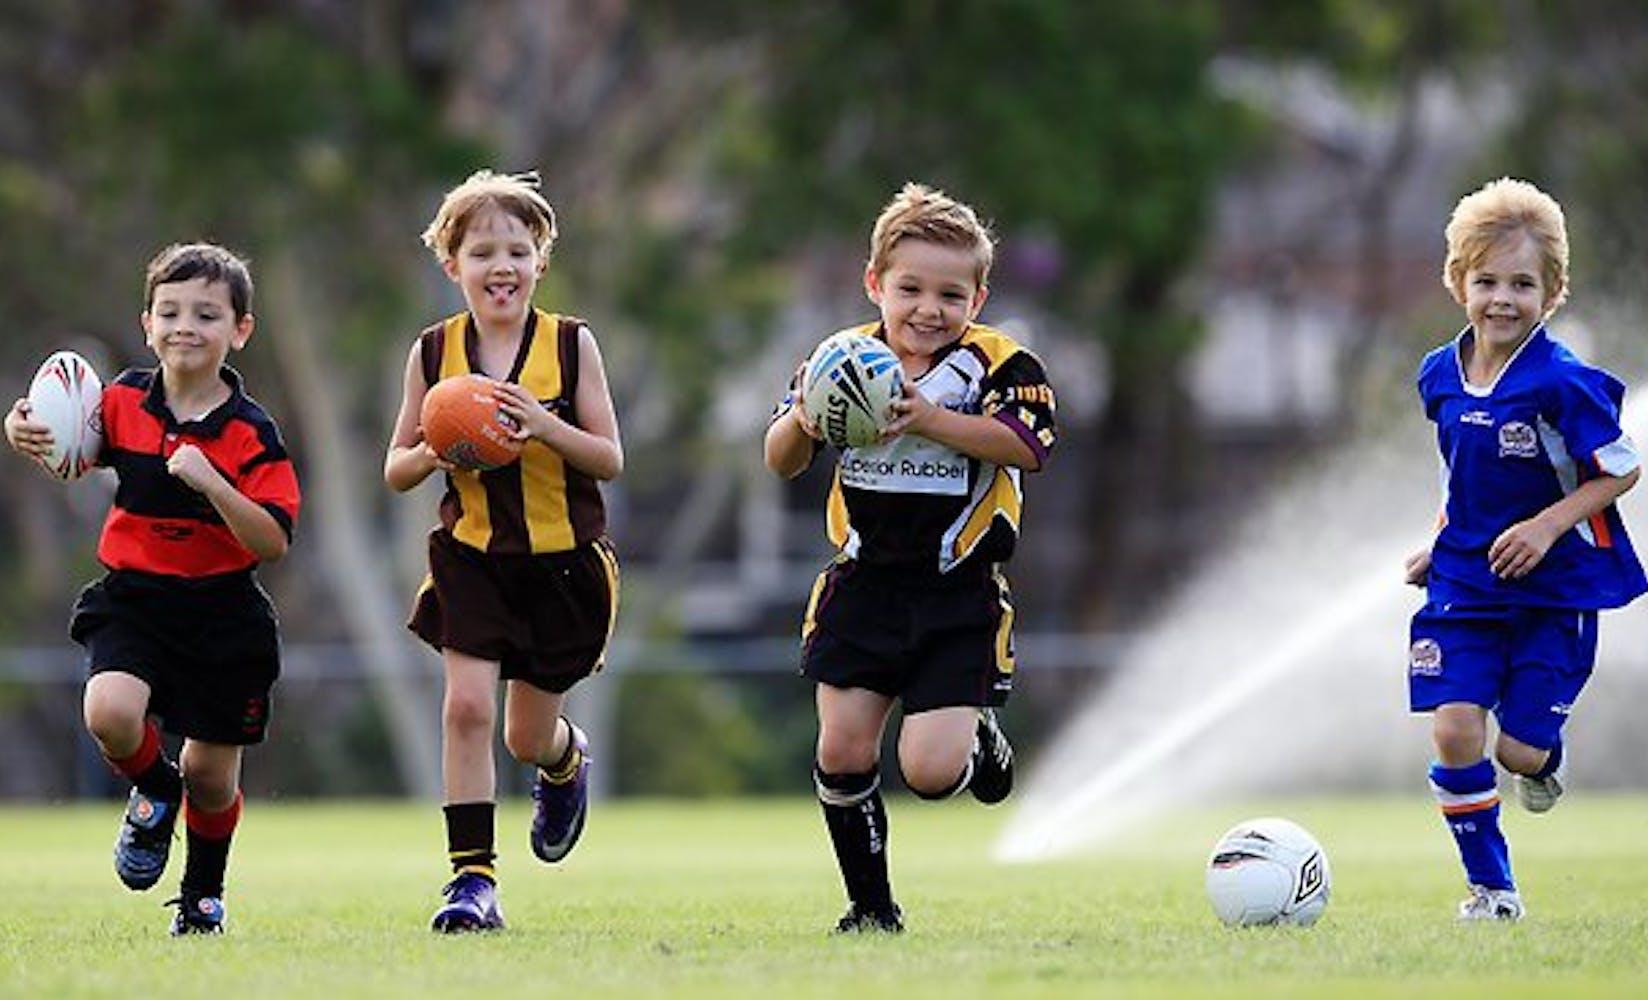 248917 children playing footy